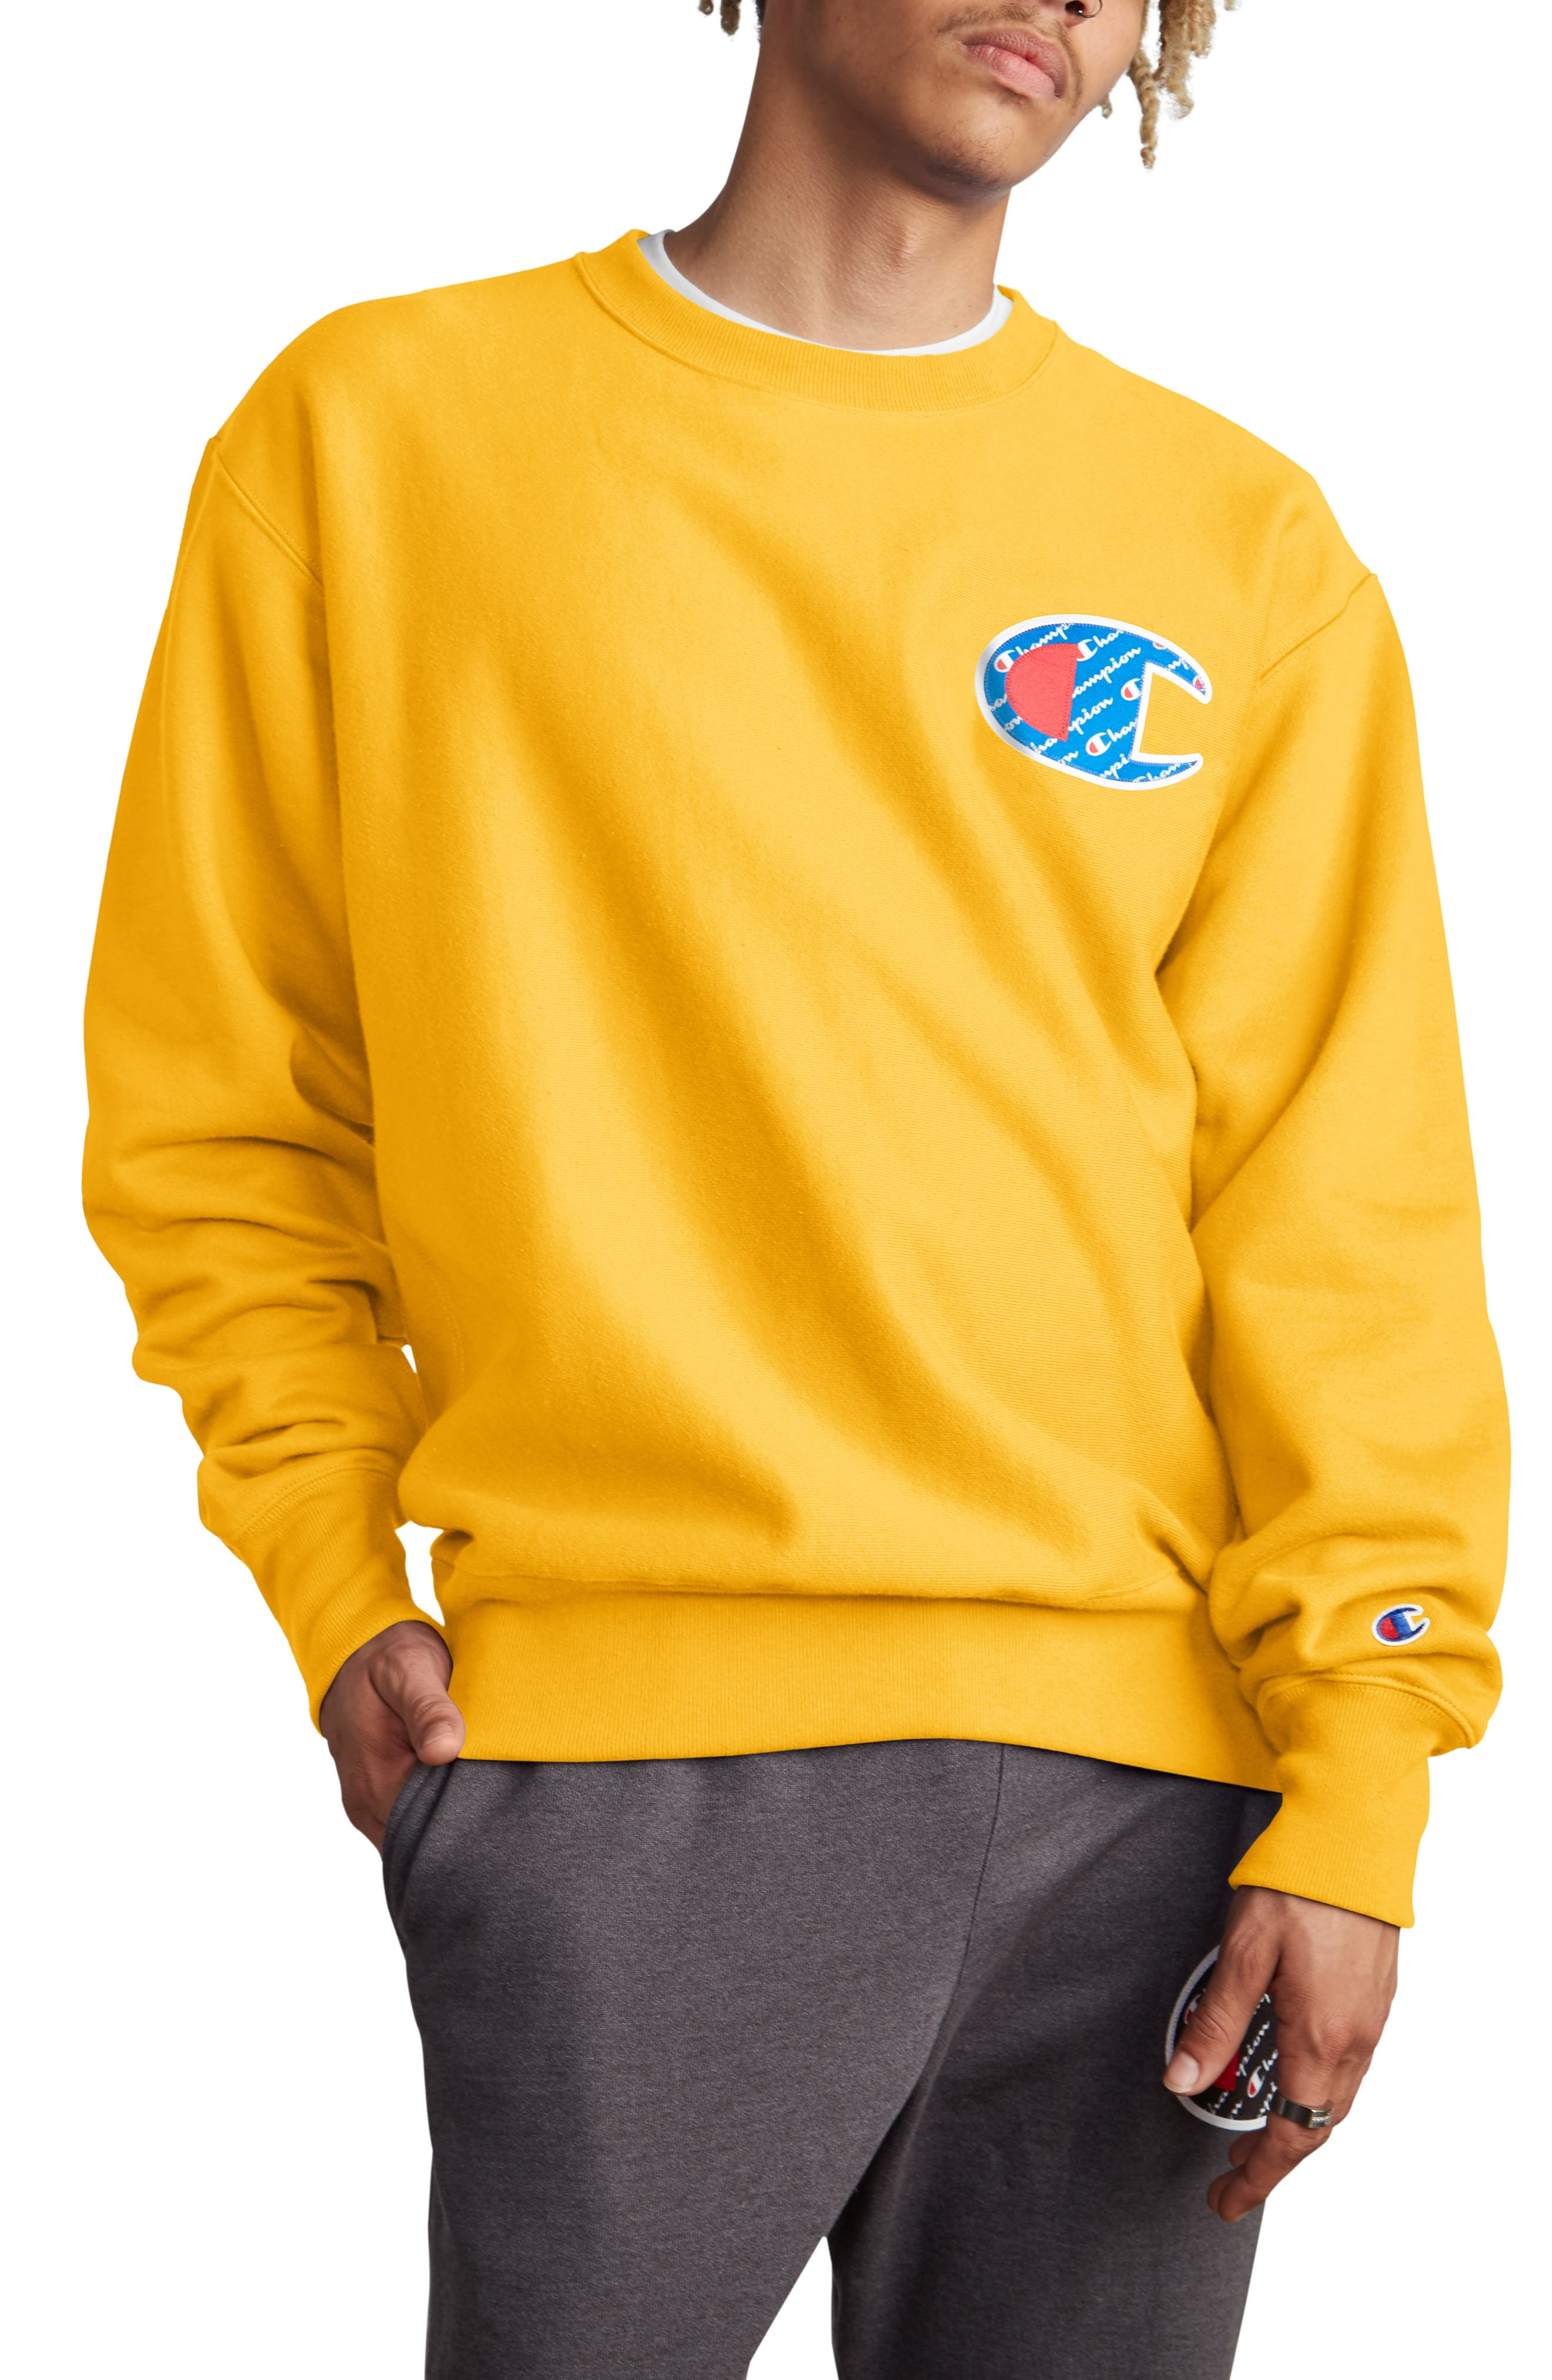 Sublimated Logo Crewneck Sweatshirt, Main, color, CHAMPION GOLD